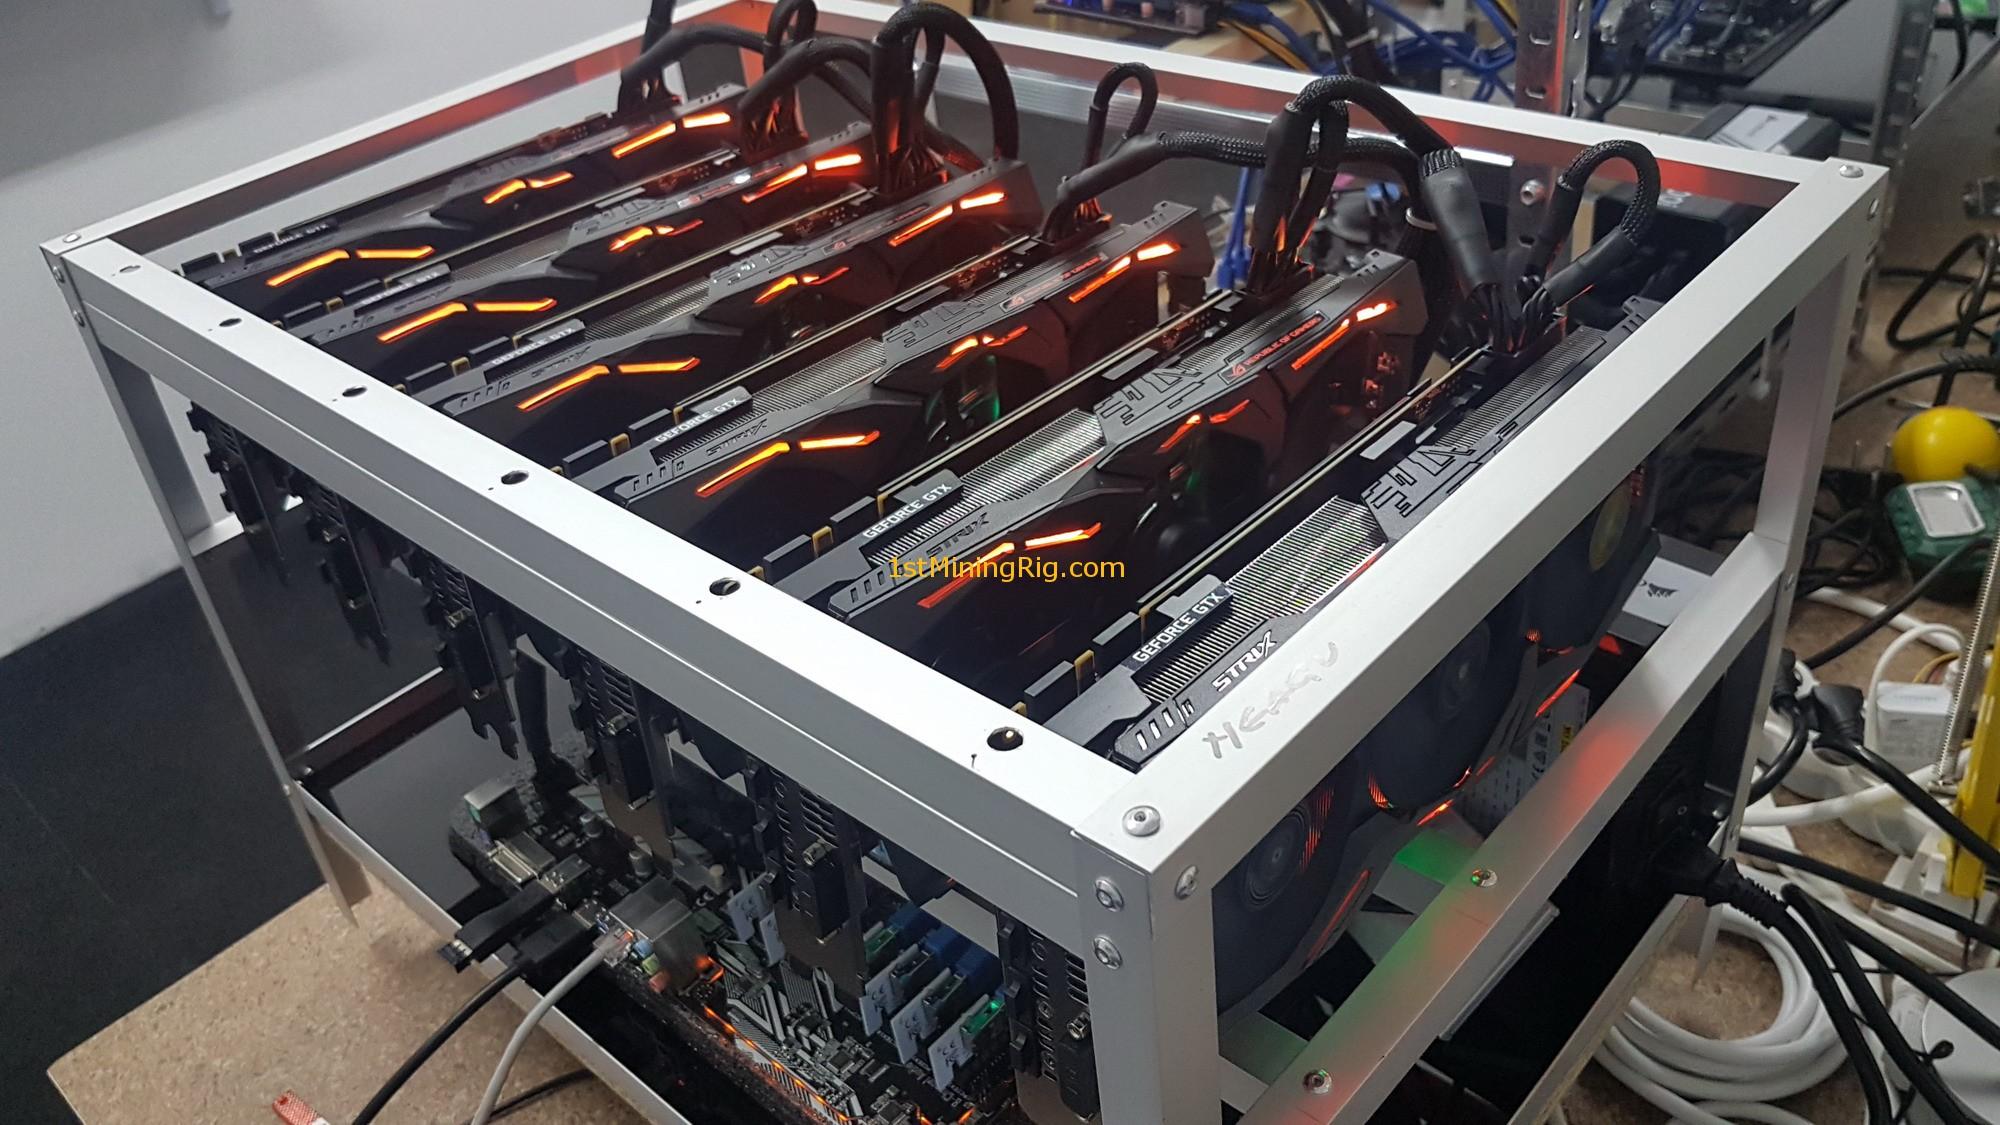 Asus Strix Geforce Gtx 1080 Ti Mining Performance Review